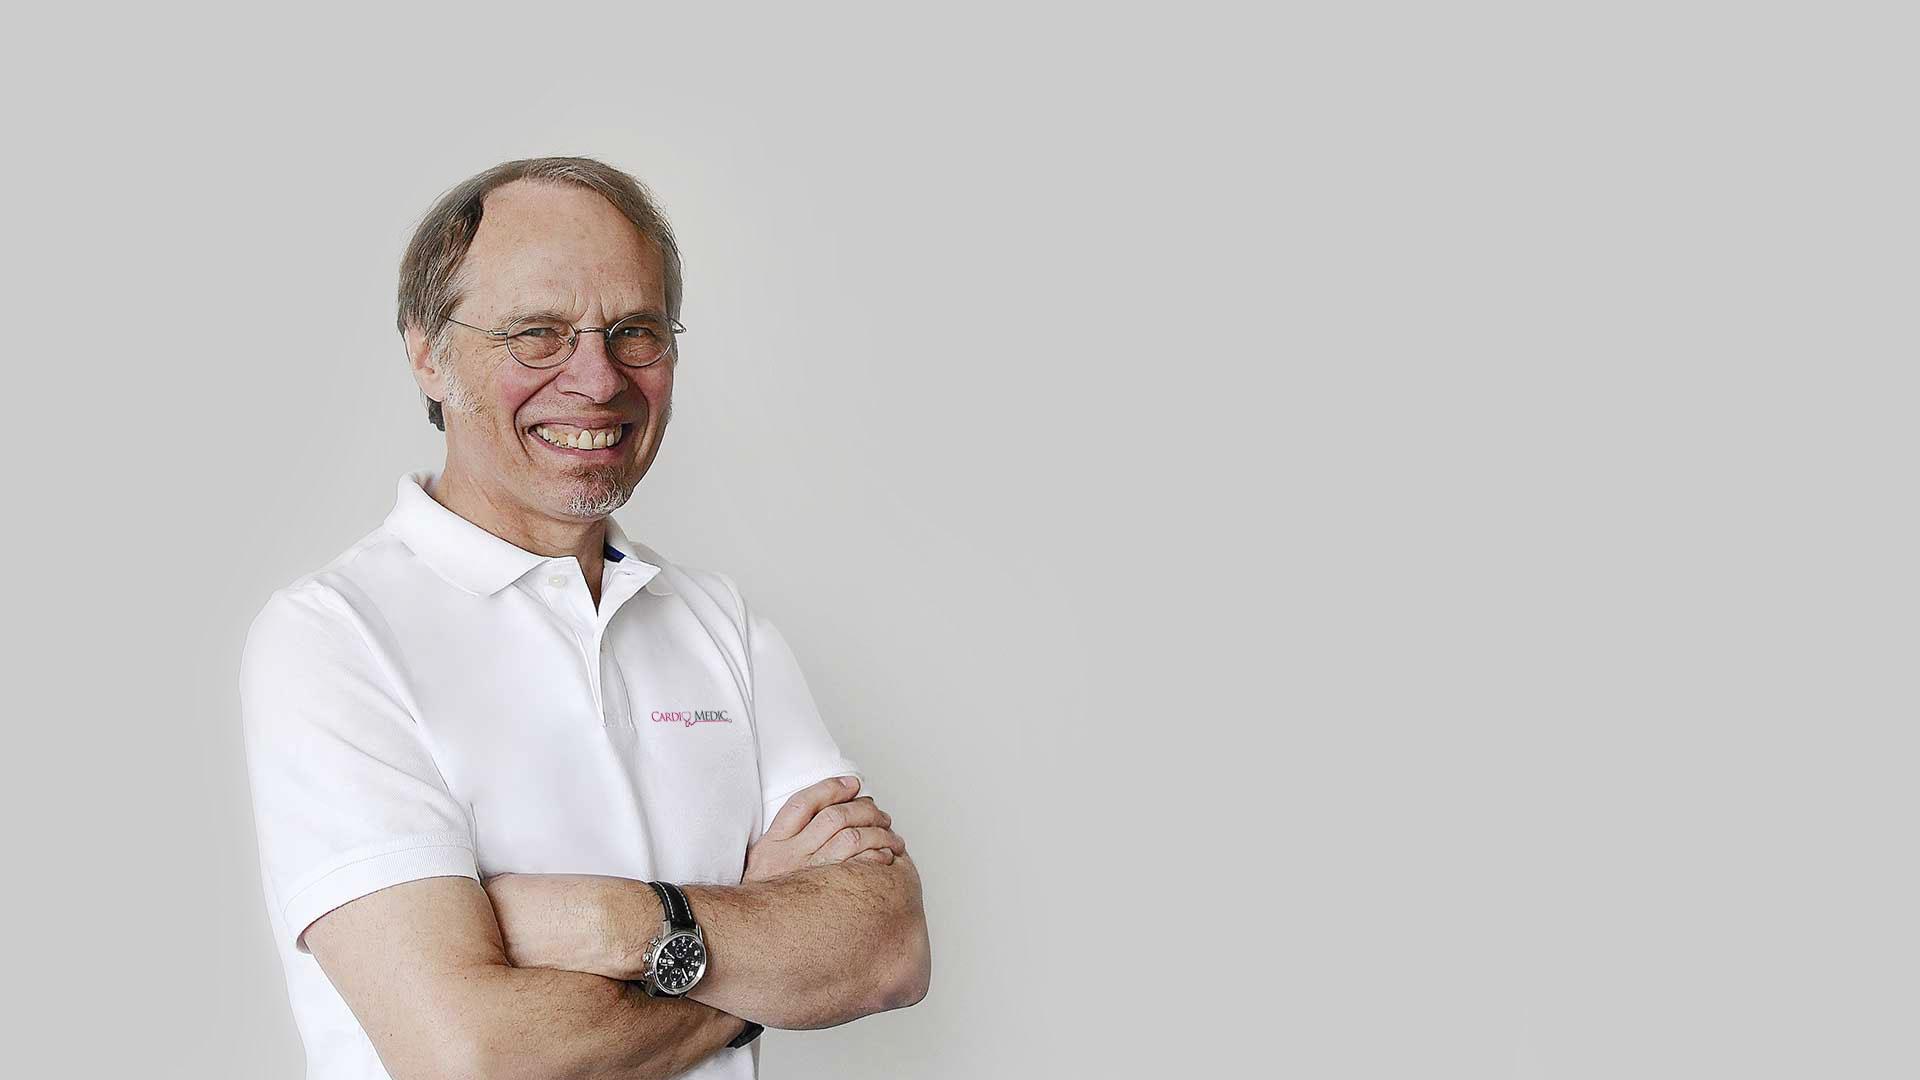 Dr. med. Michael Richter – Cardio Medic - Kardiologie Altstetten